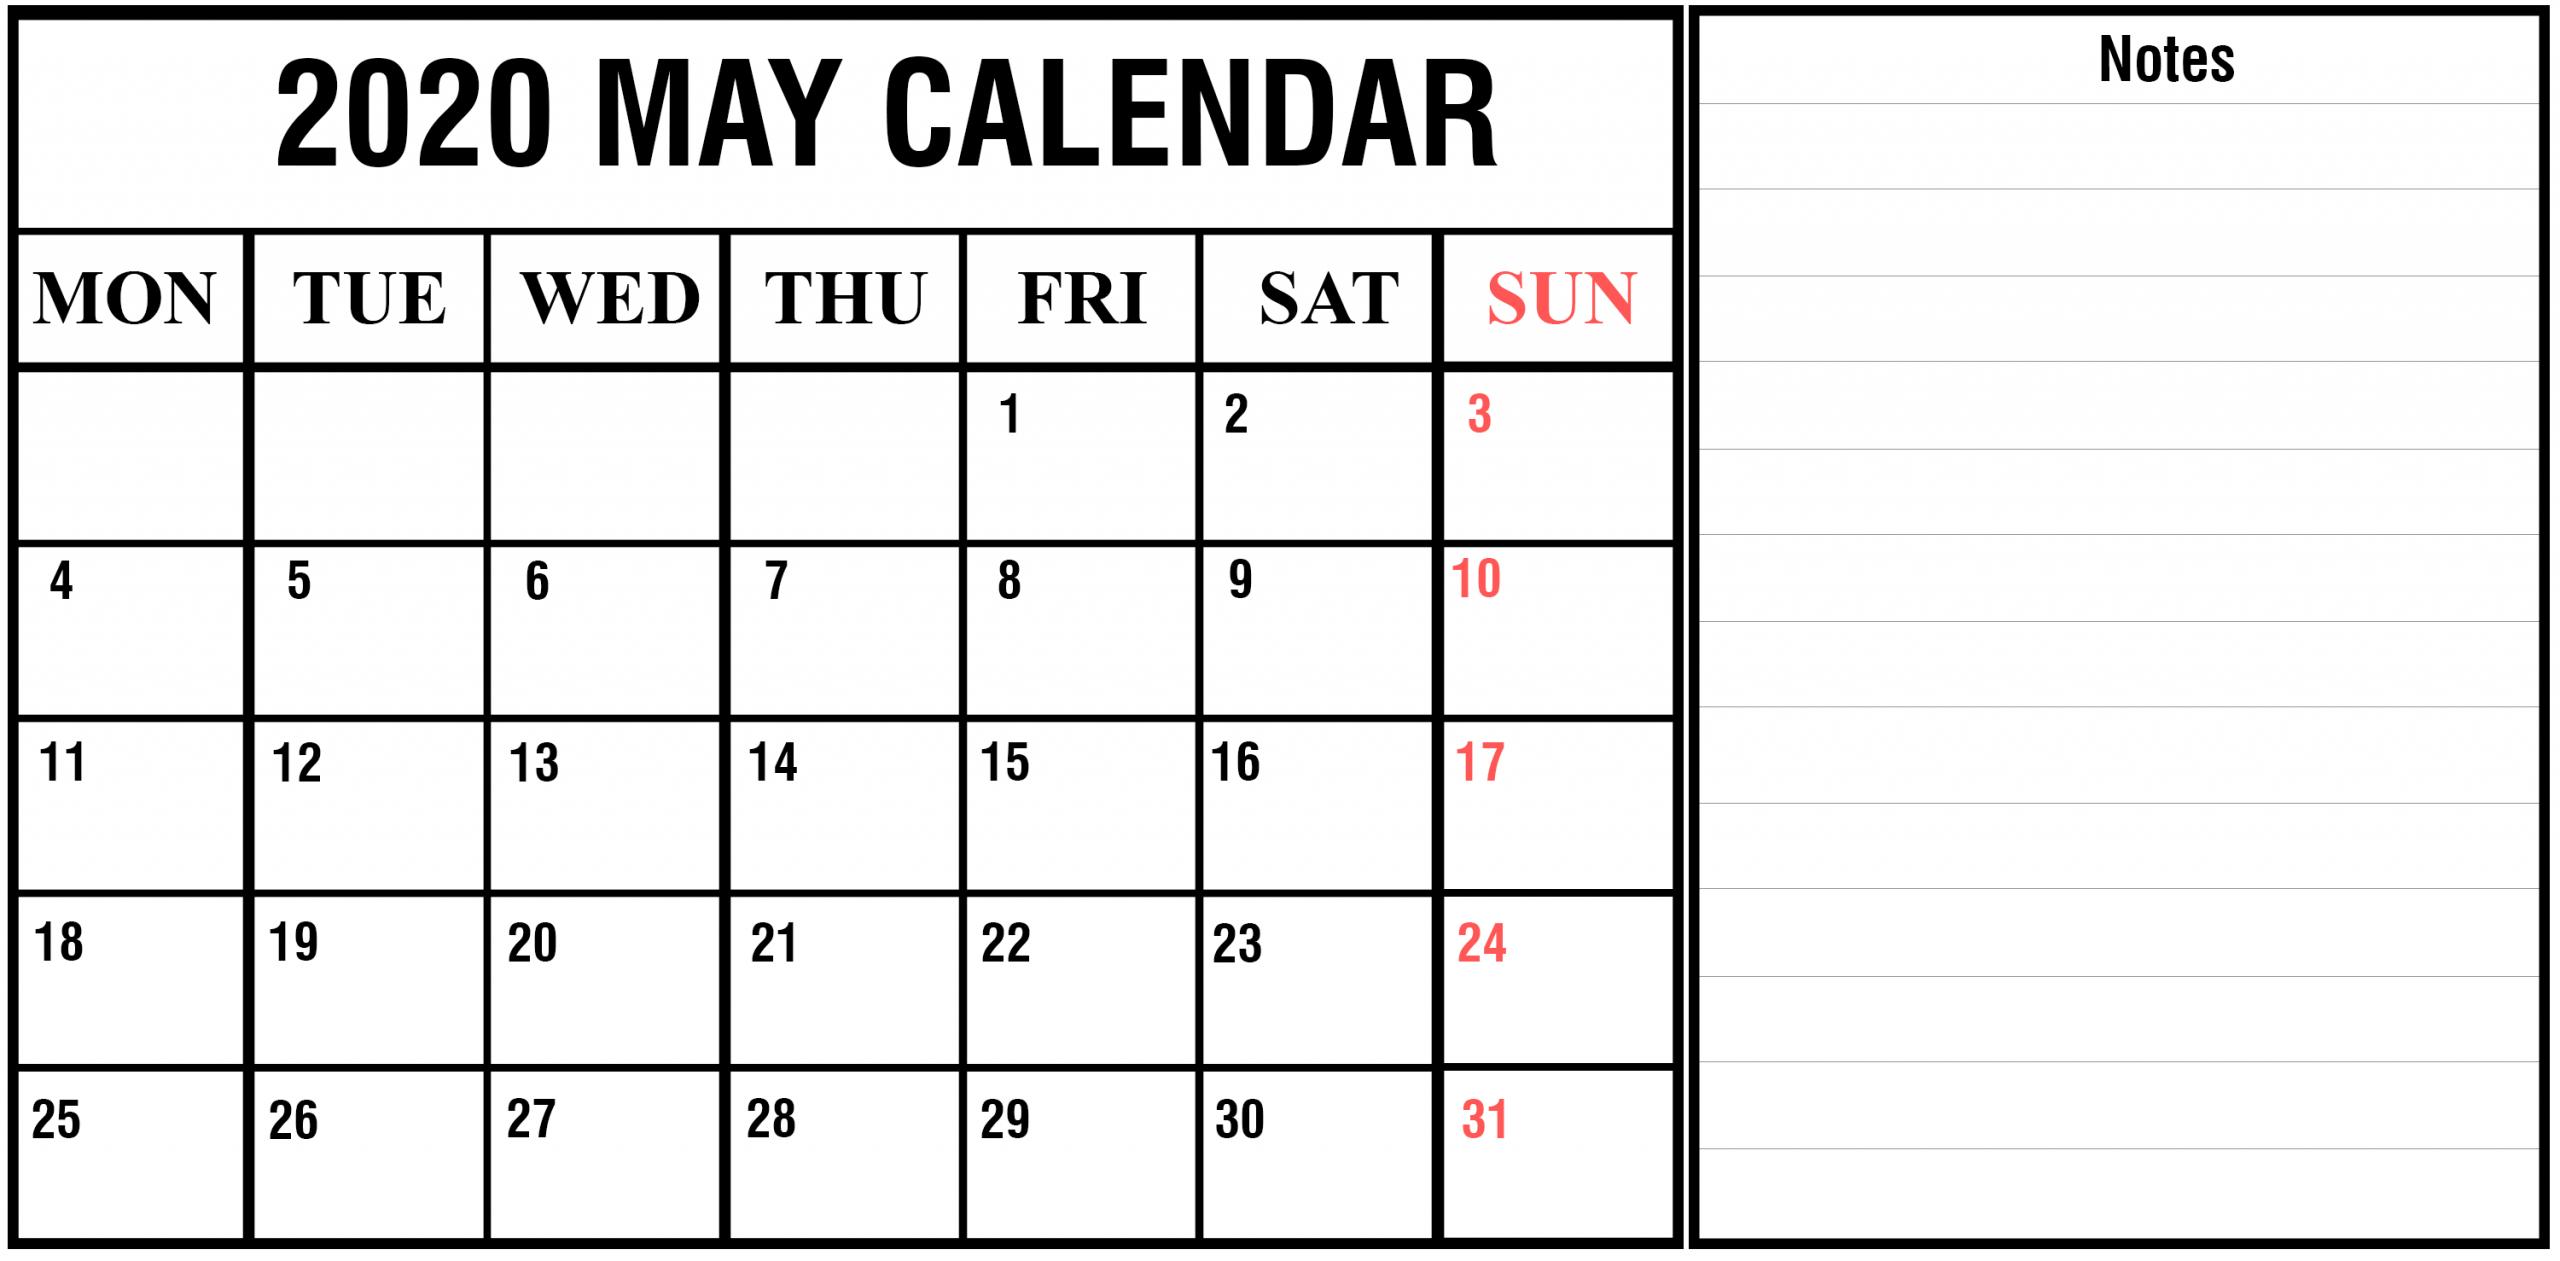 Download Free Blank May 2020 Printable Calendar [Pdf Free Online Printable Calendar Without Downloading